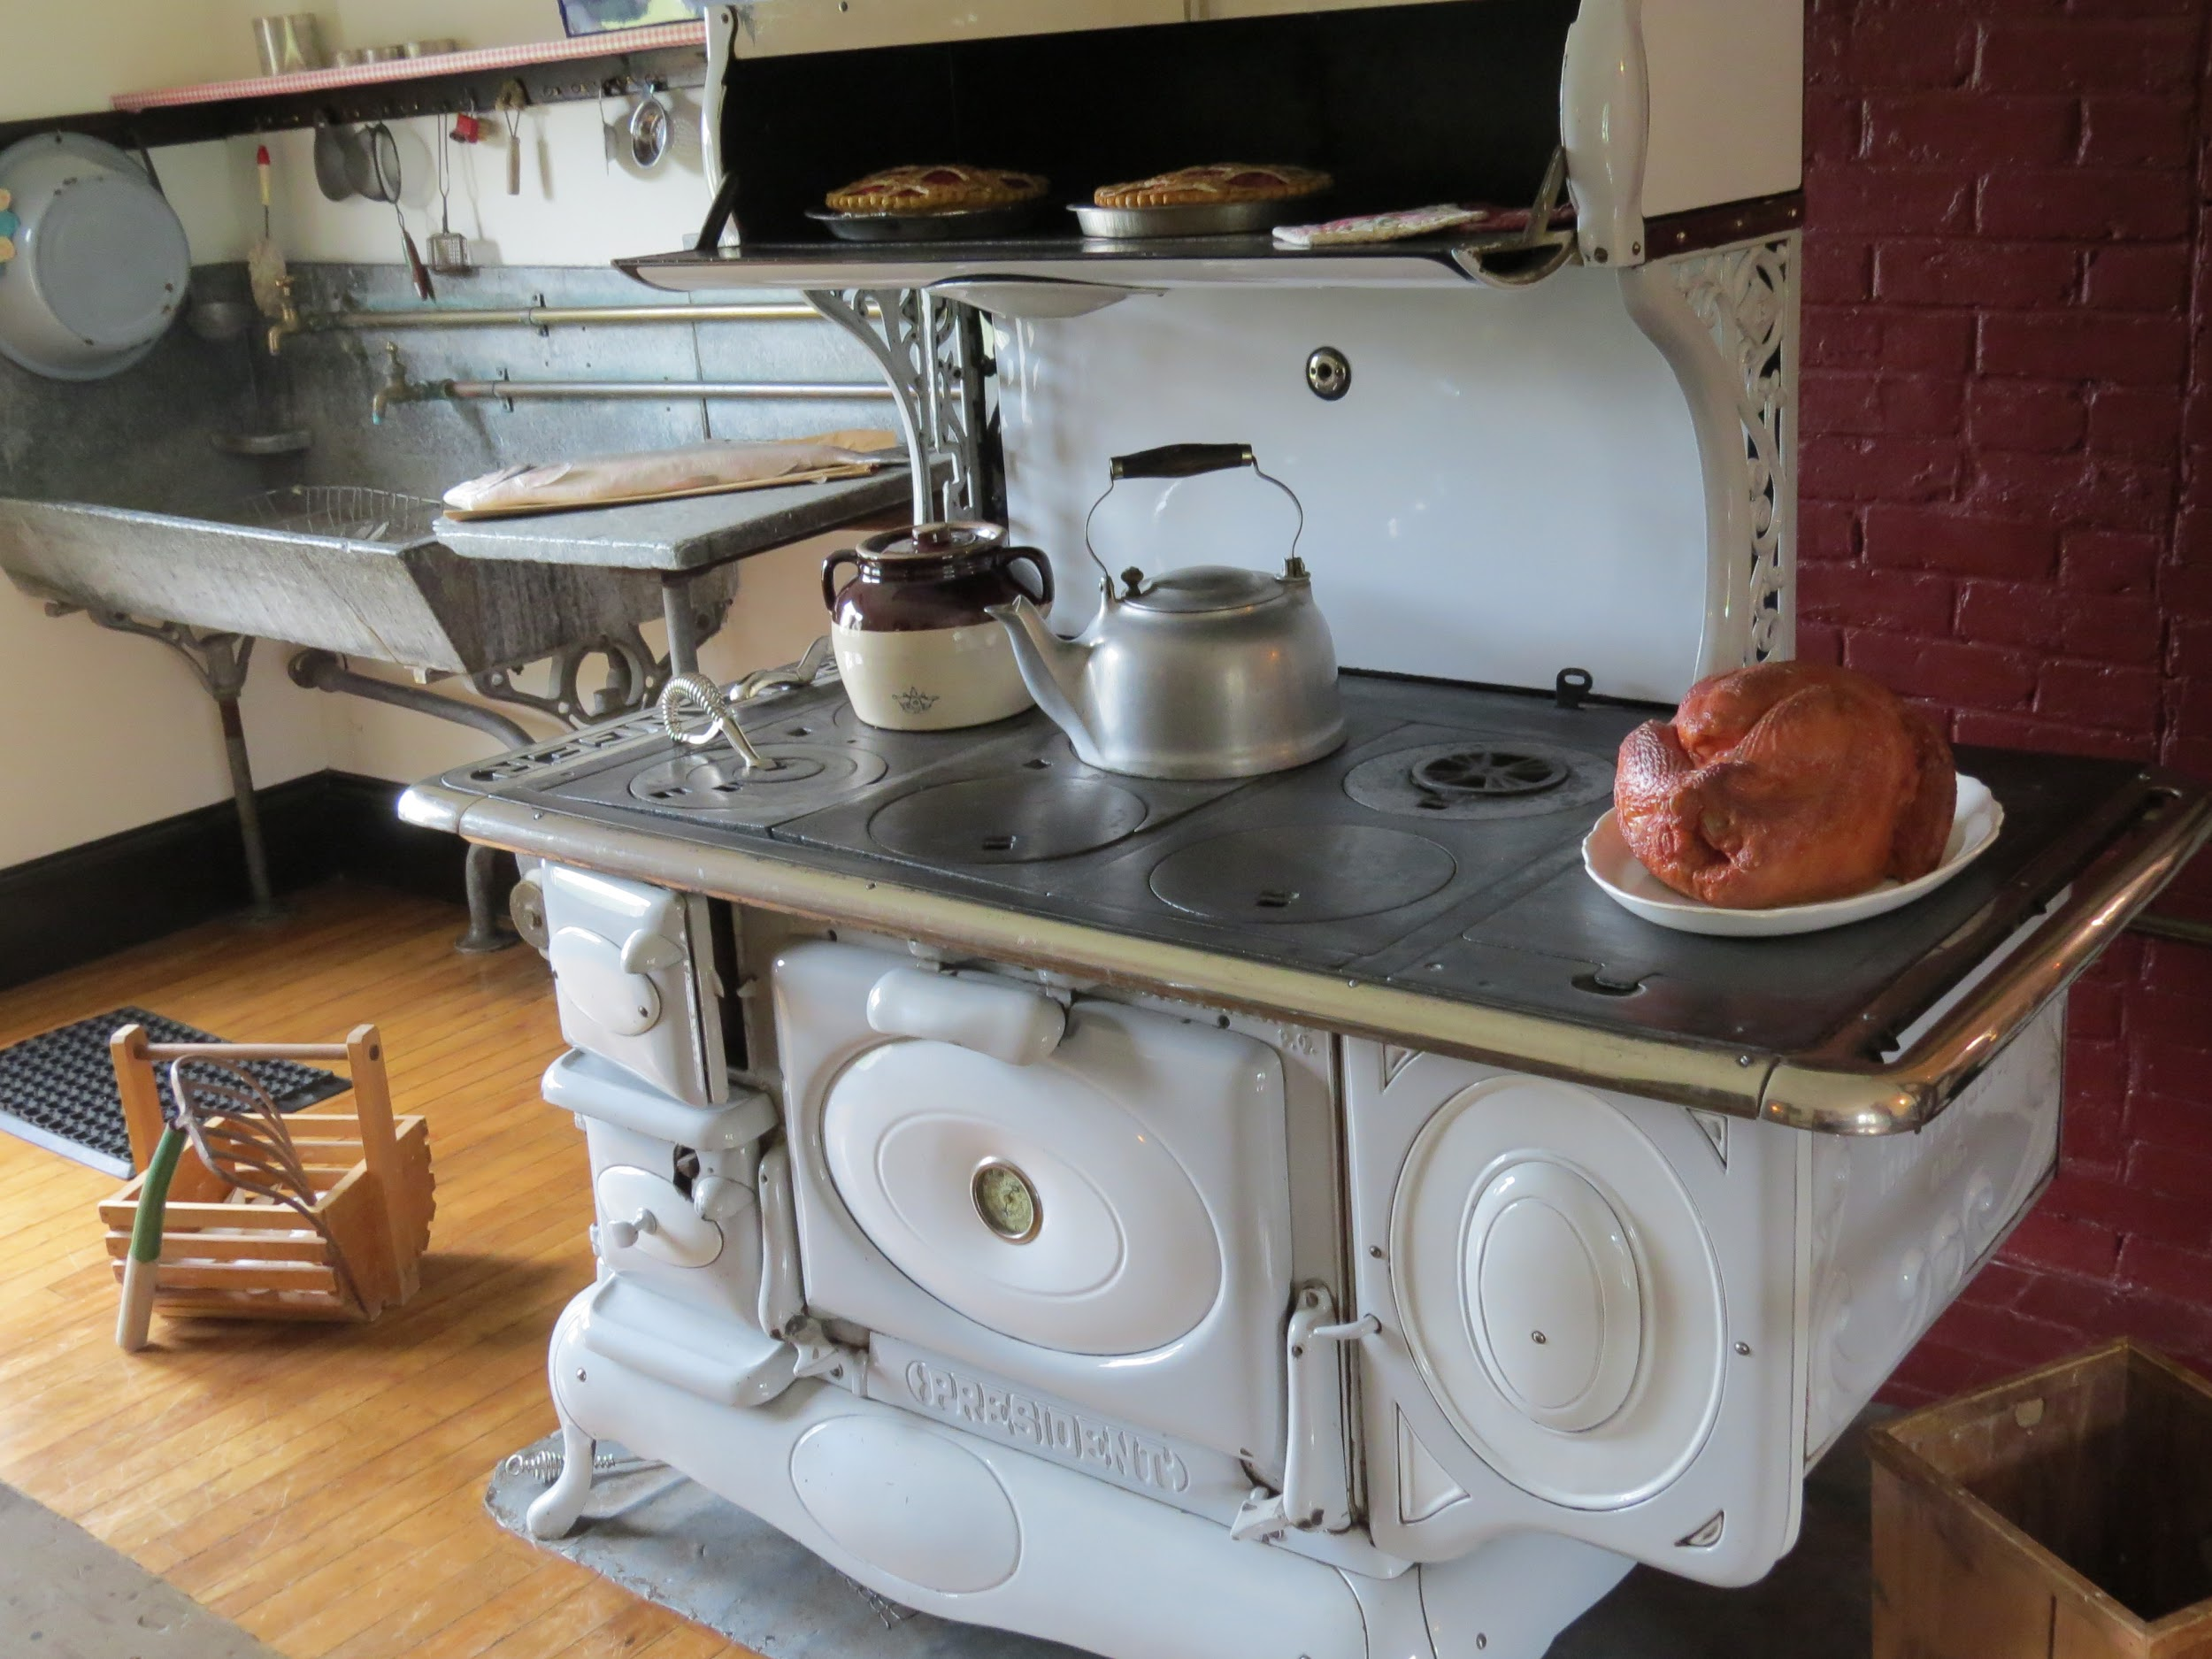 Kitcehn stove, Roosevelt Cottage, Campobello, NB